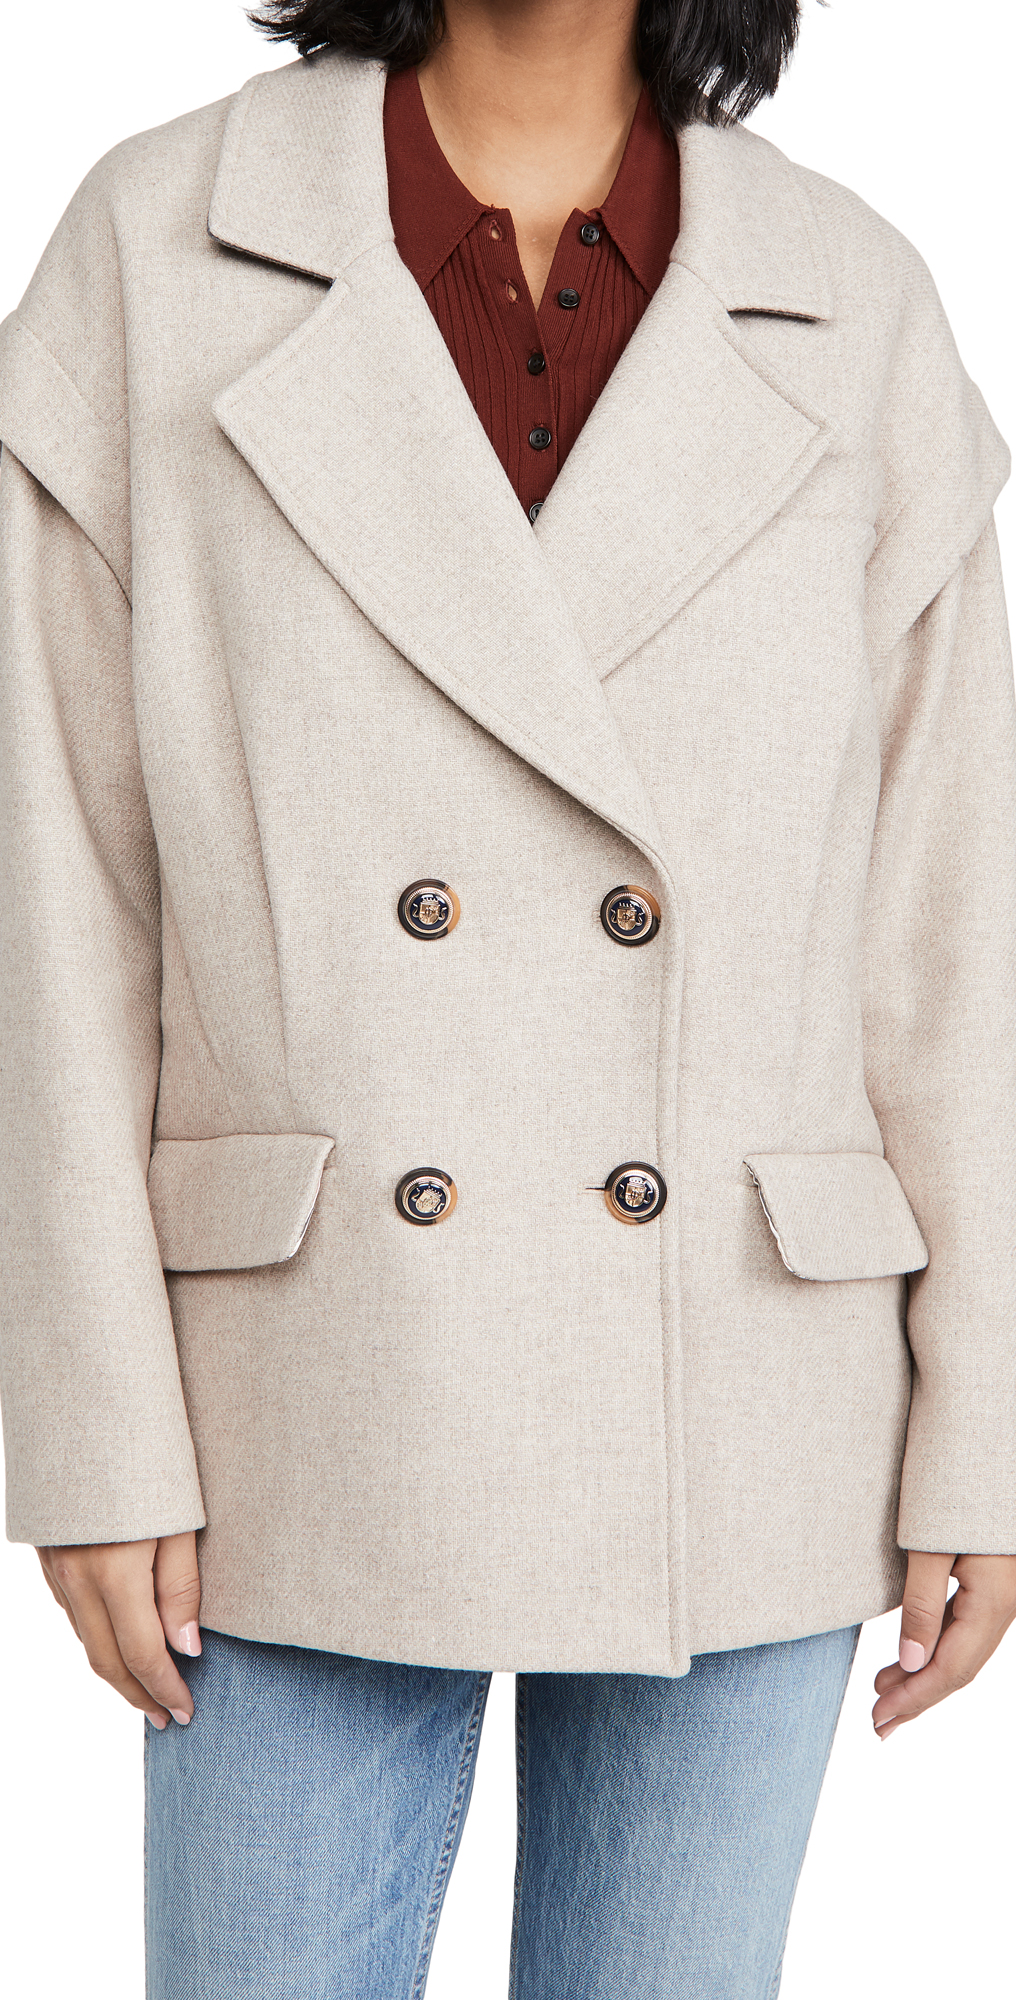 Veronica Beard Ikaria Coat